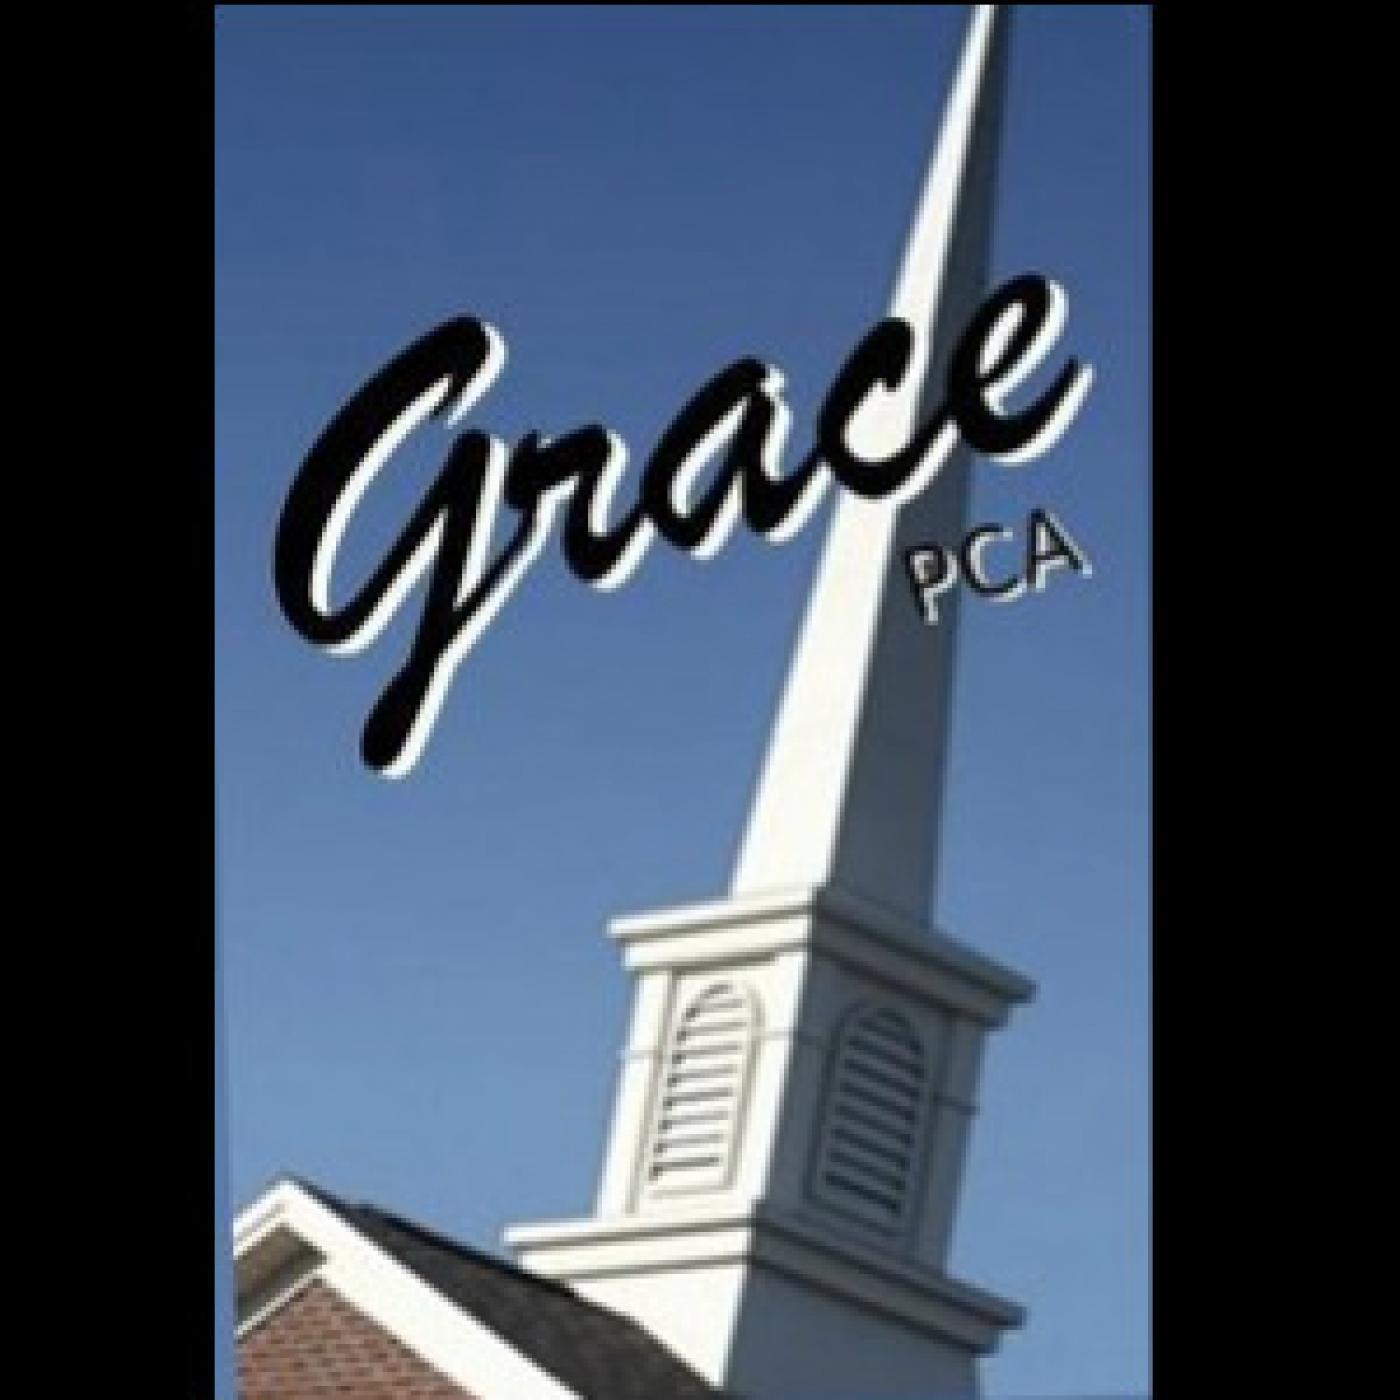 Grace PCA Sermons